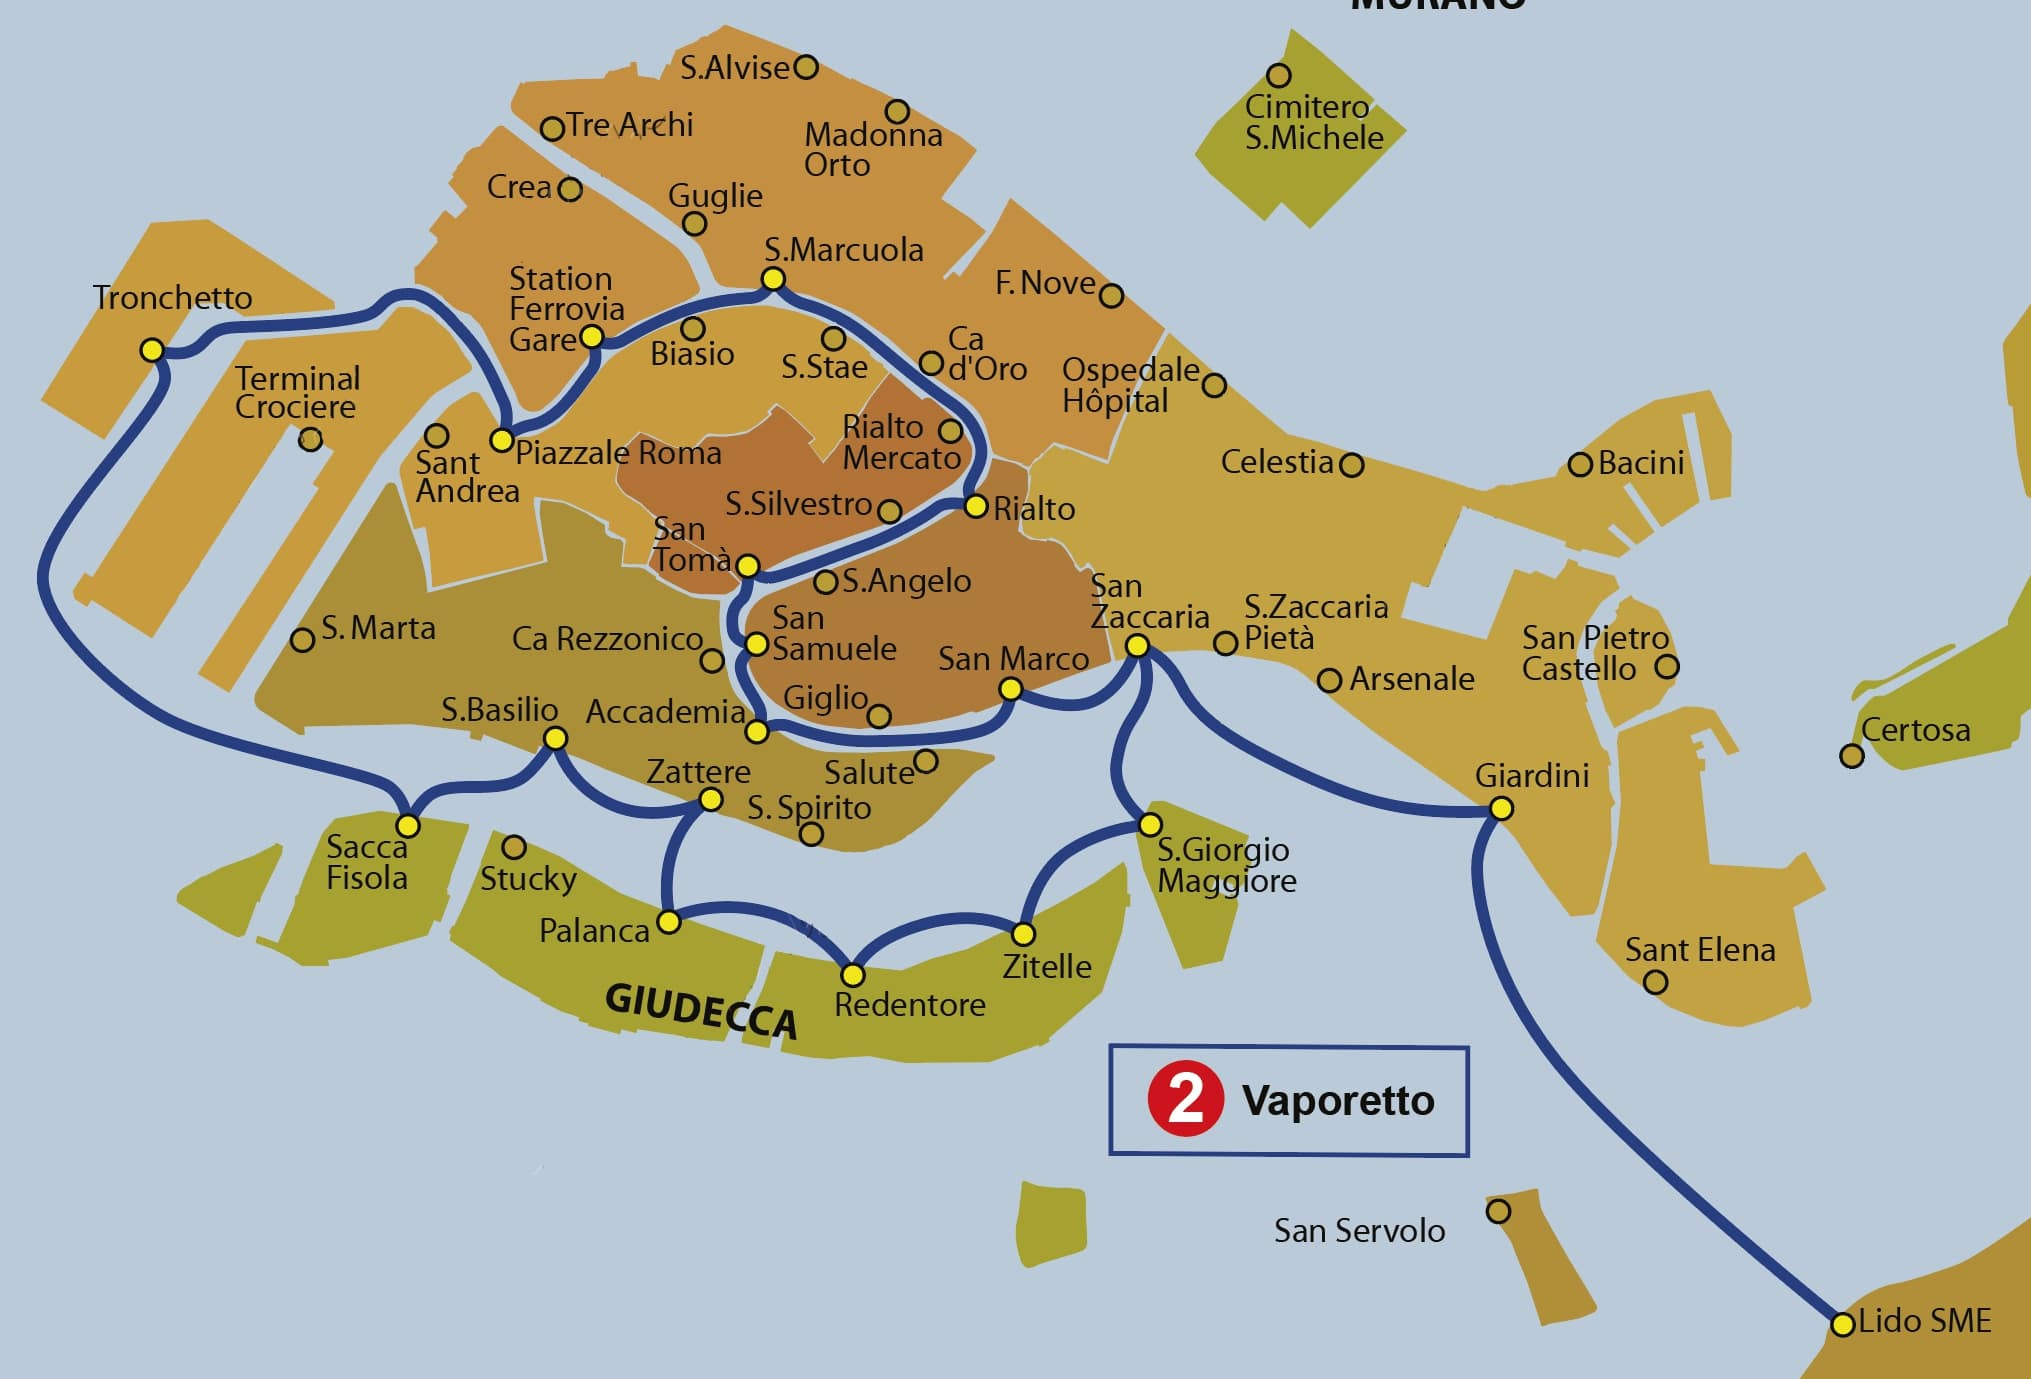 Схема маршрута вапоретто № 2 в Венеции